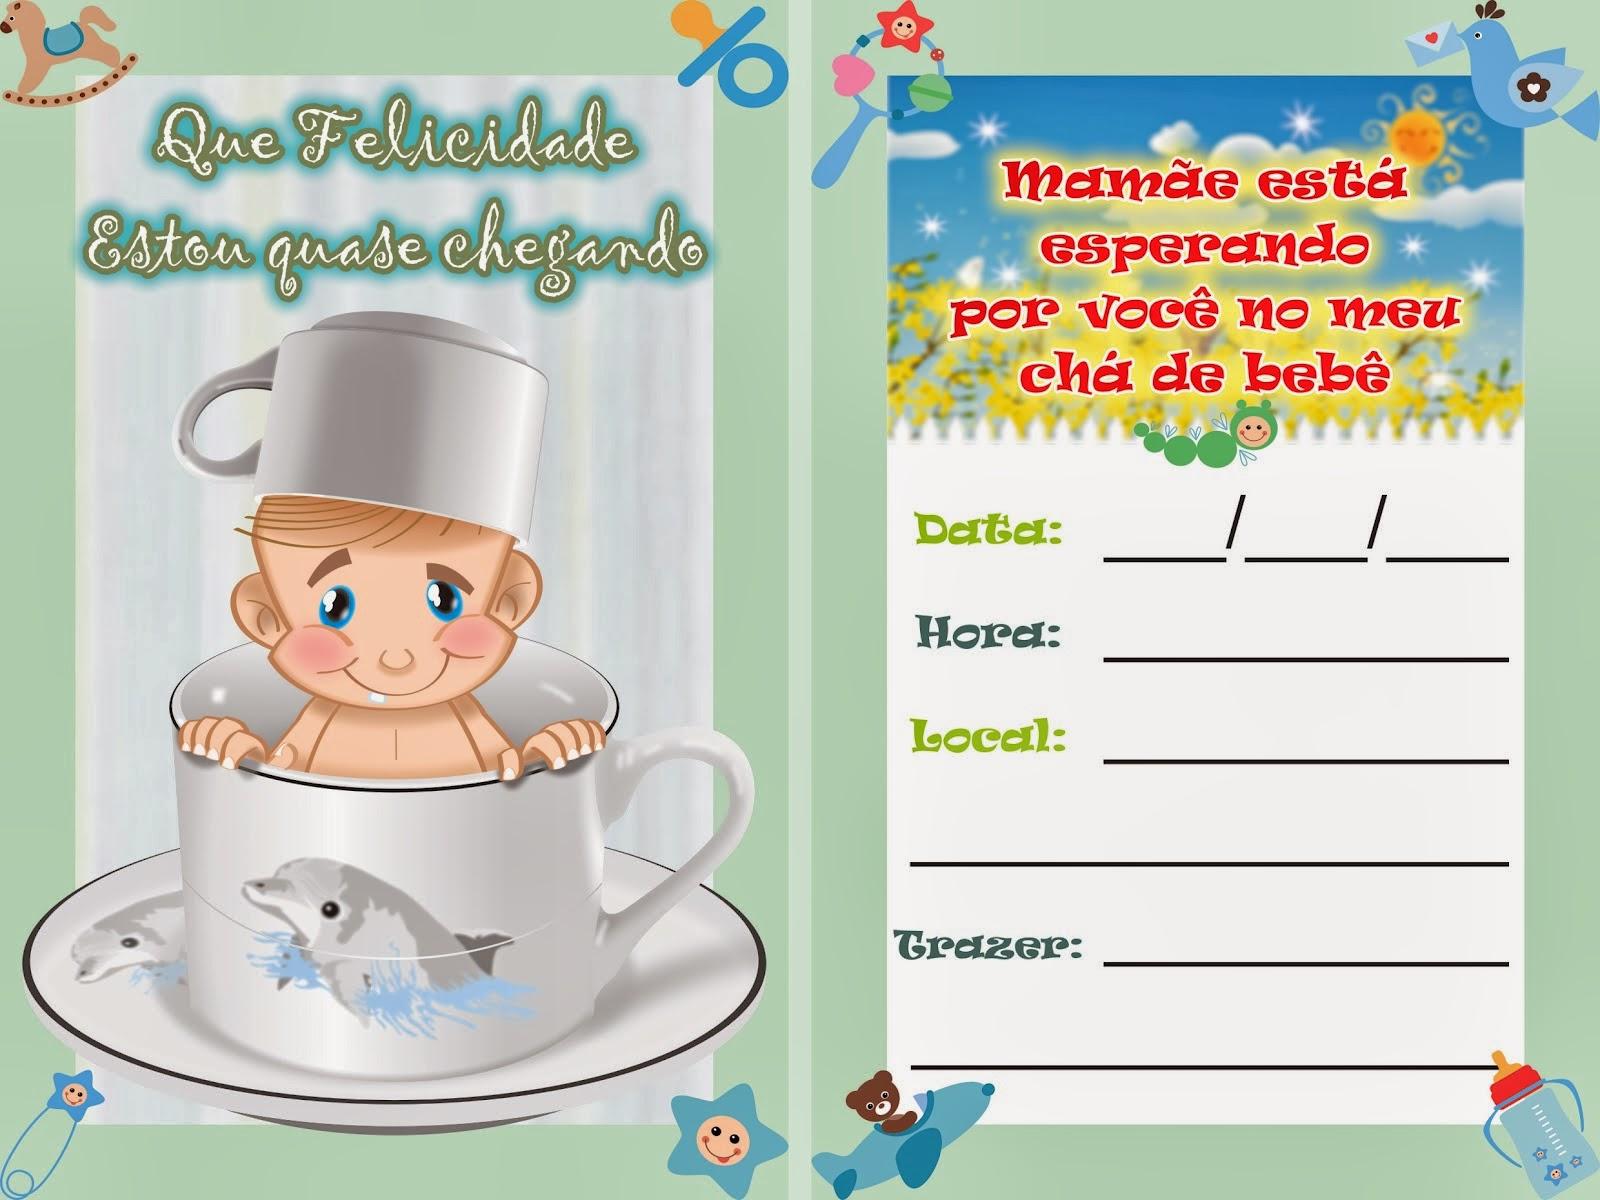 Convite para chá de bebê online 3